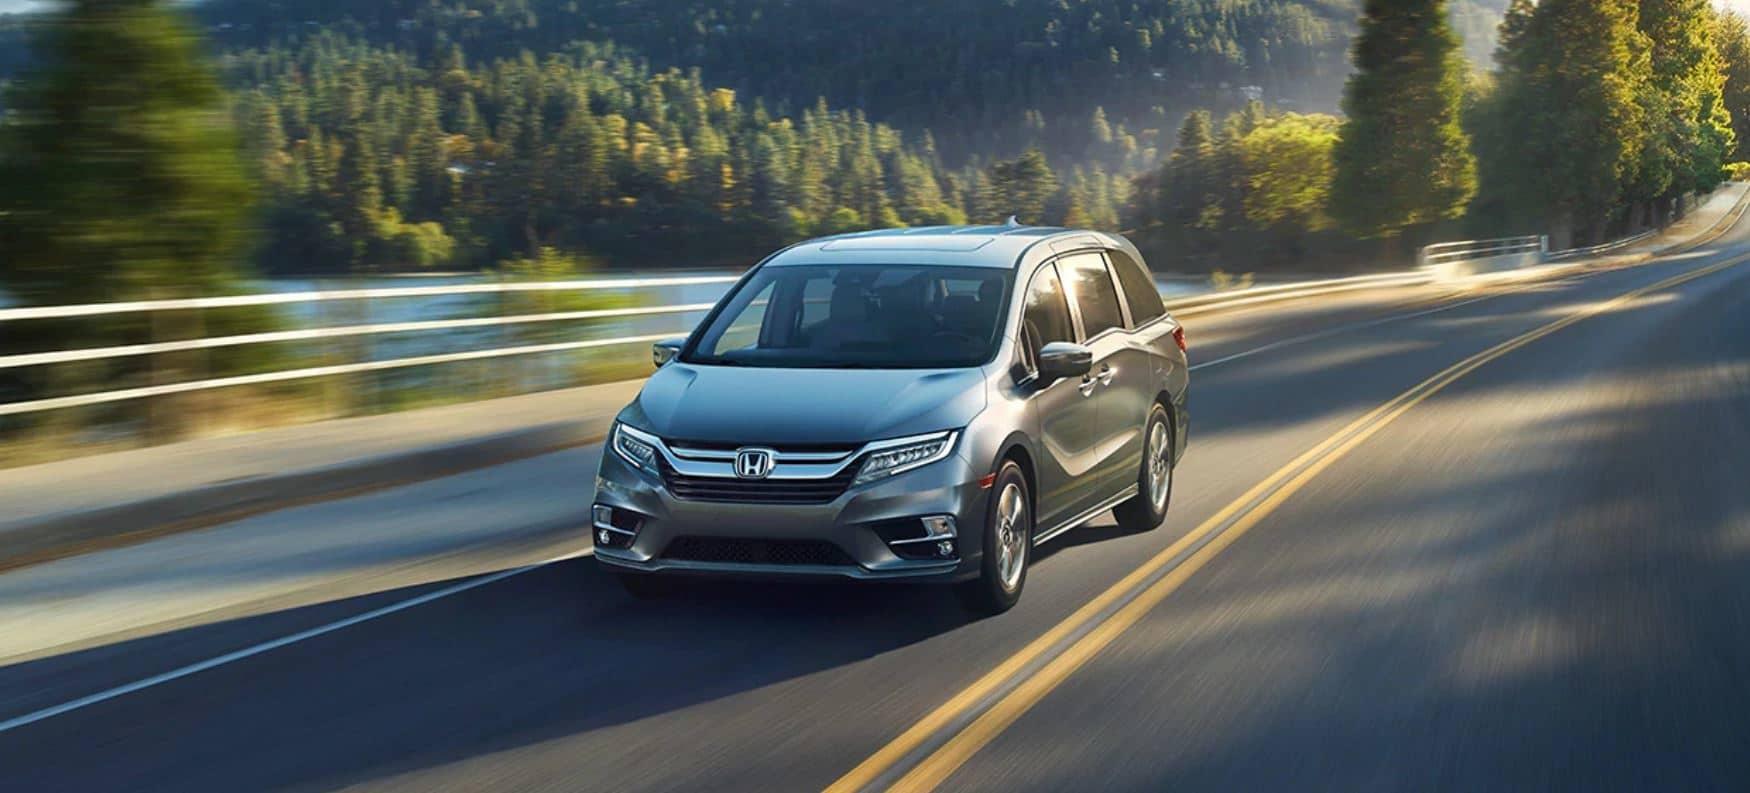 Honda Home Delivery to Burlington IA